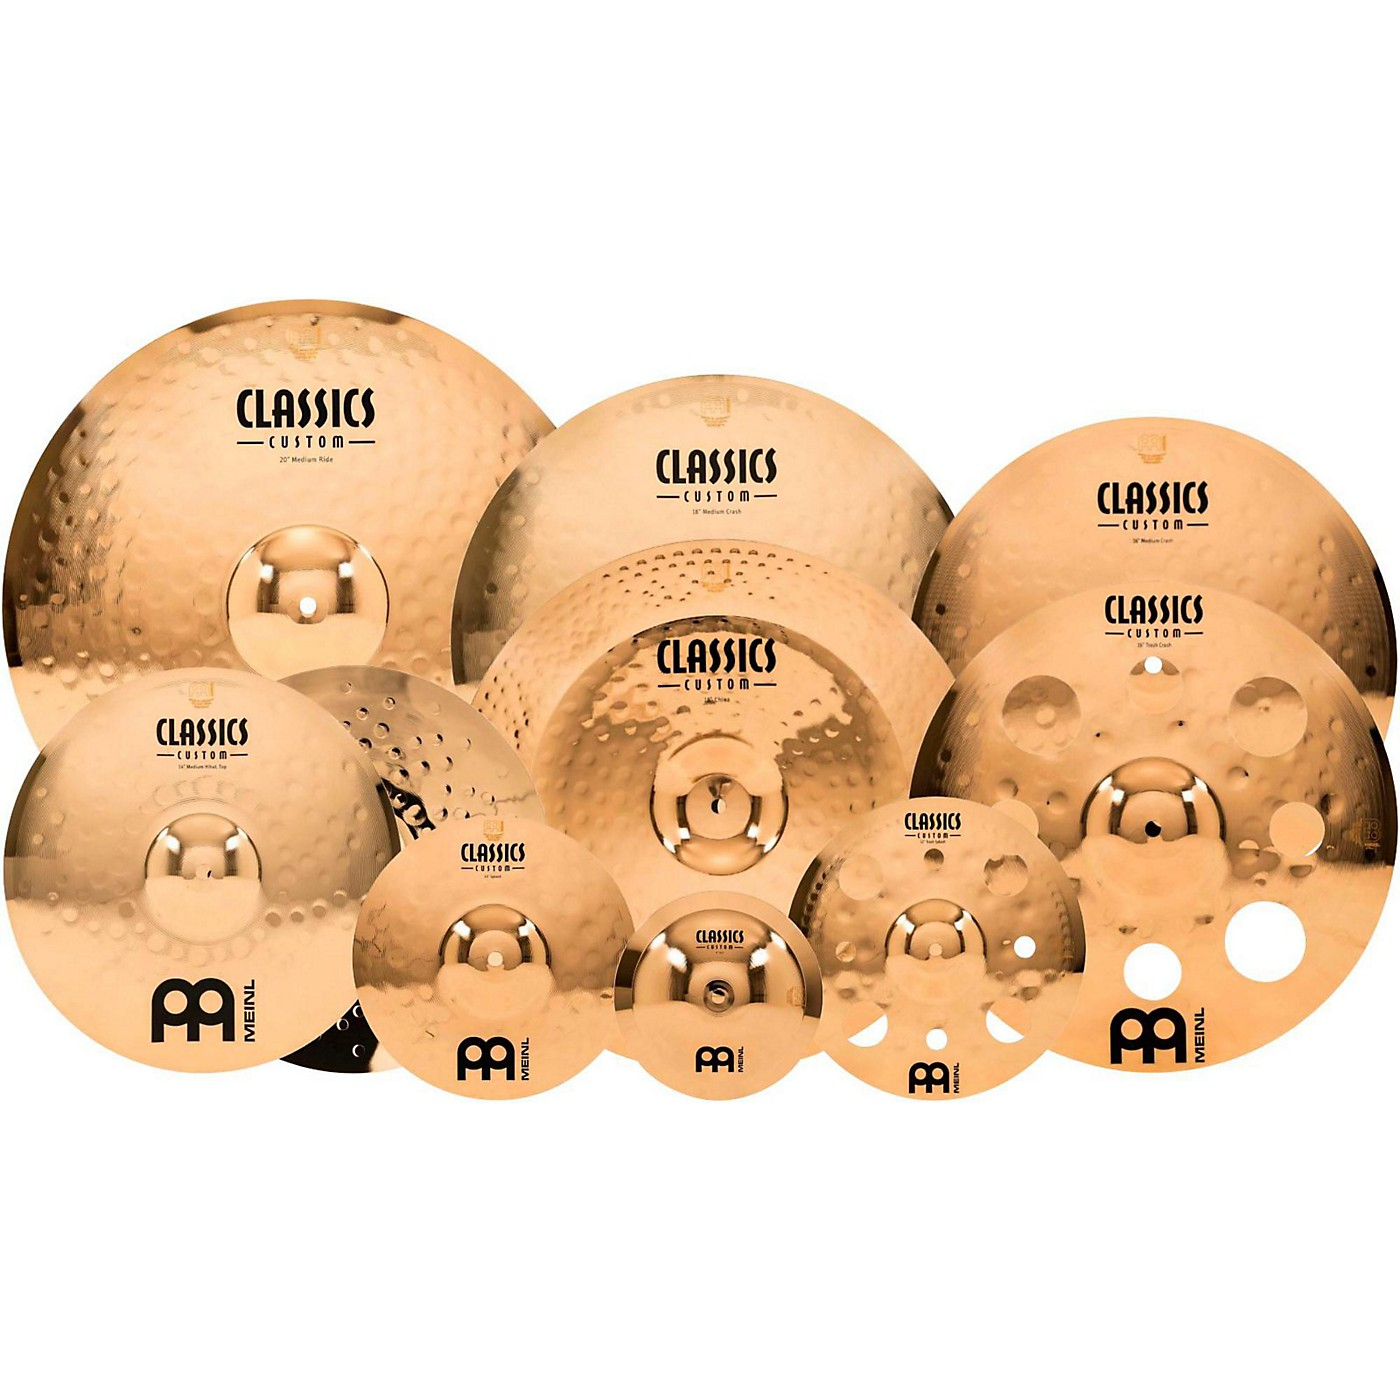 Meinl Classics Custom Triple Bonus Pack Cymbal Box Set with FREE 8